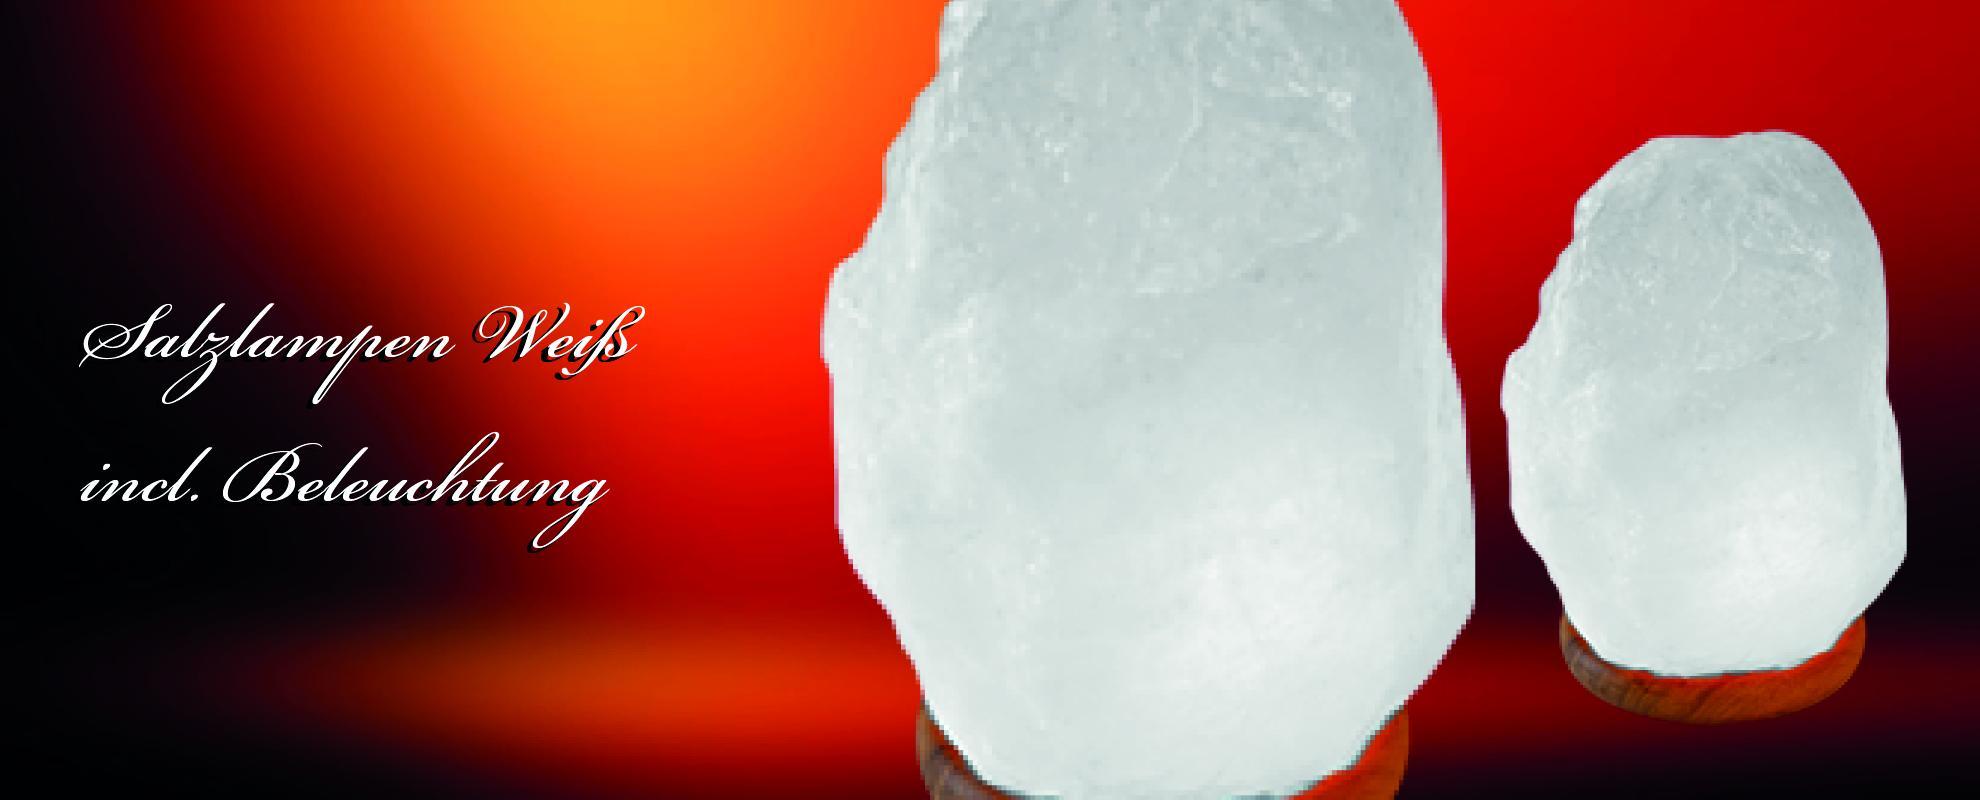 Salzlampen